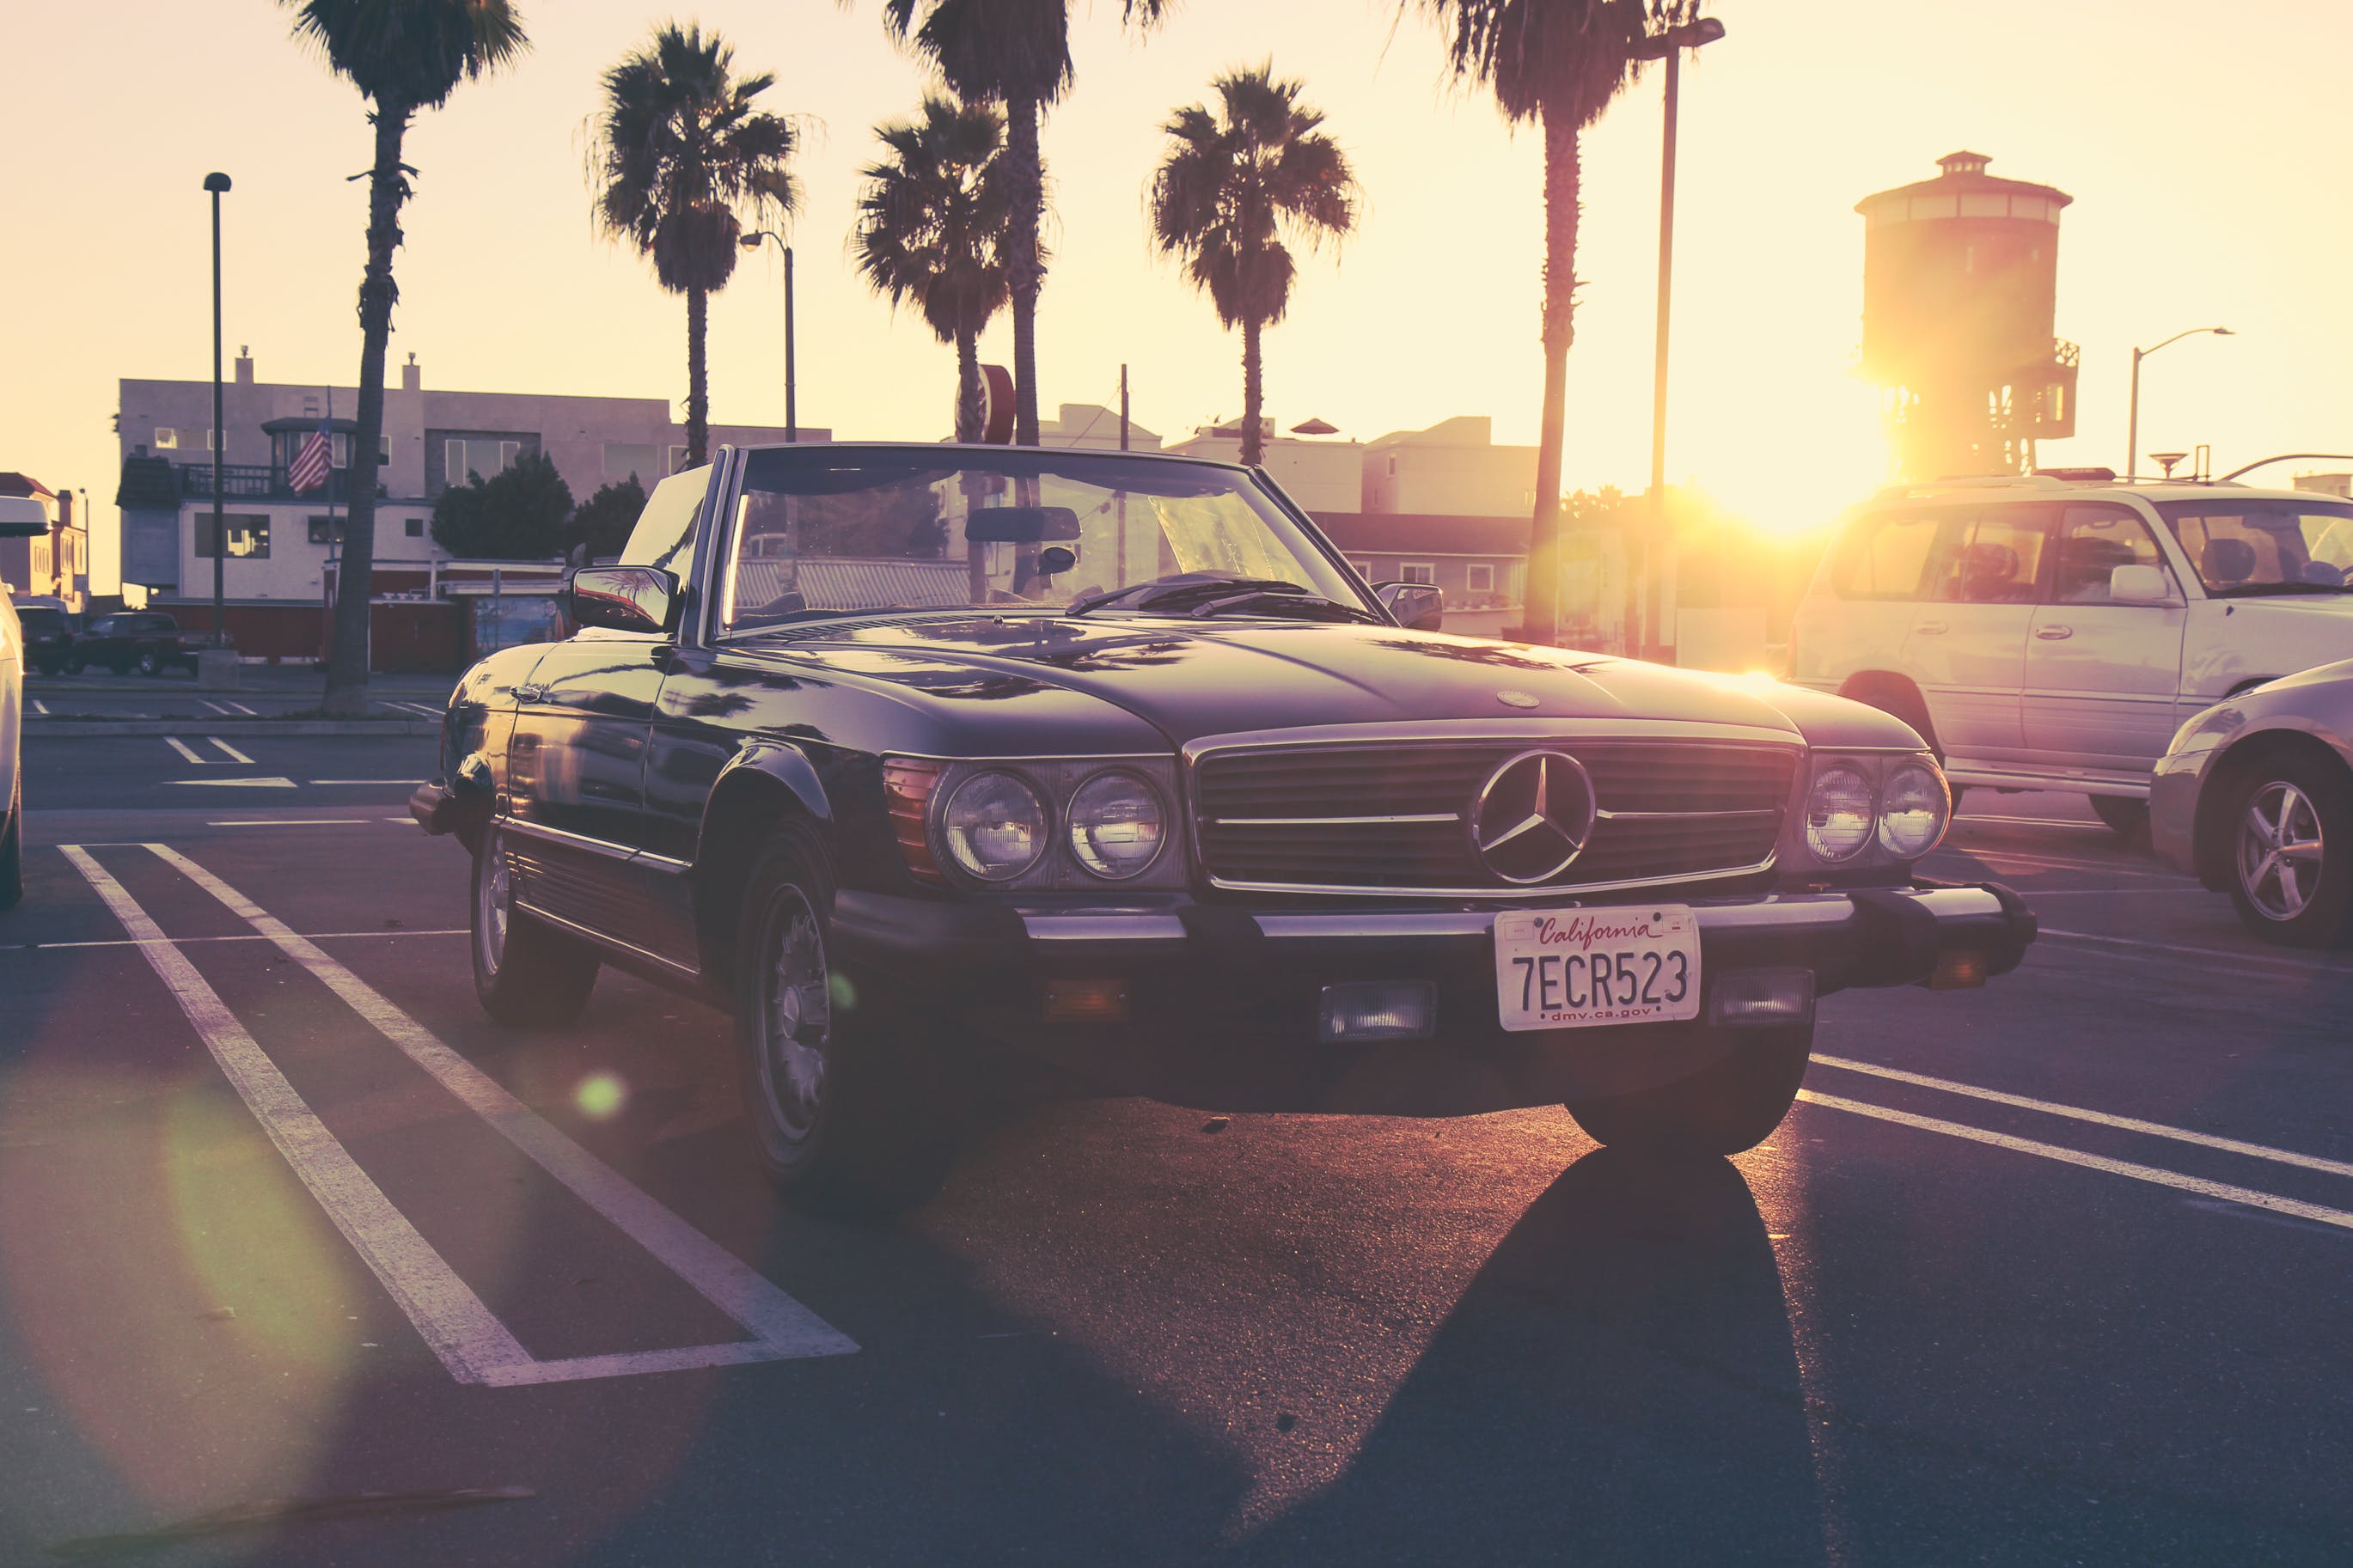 Black Mercedes-benz Car at the Parking Lot